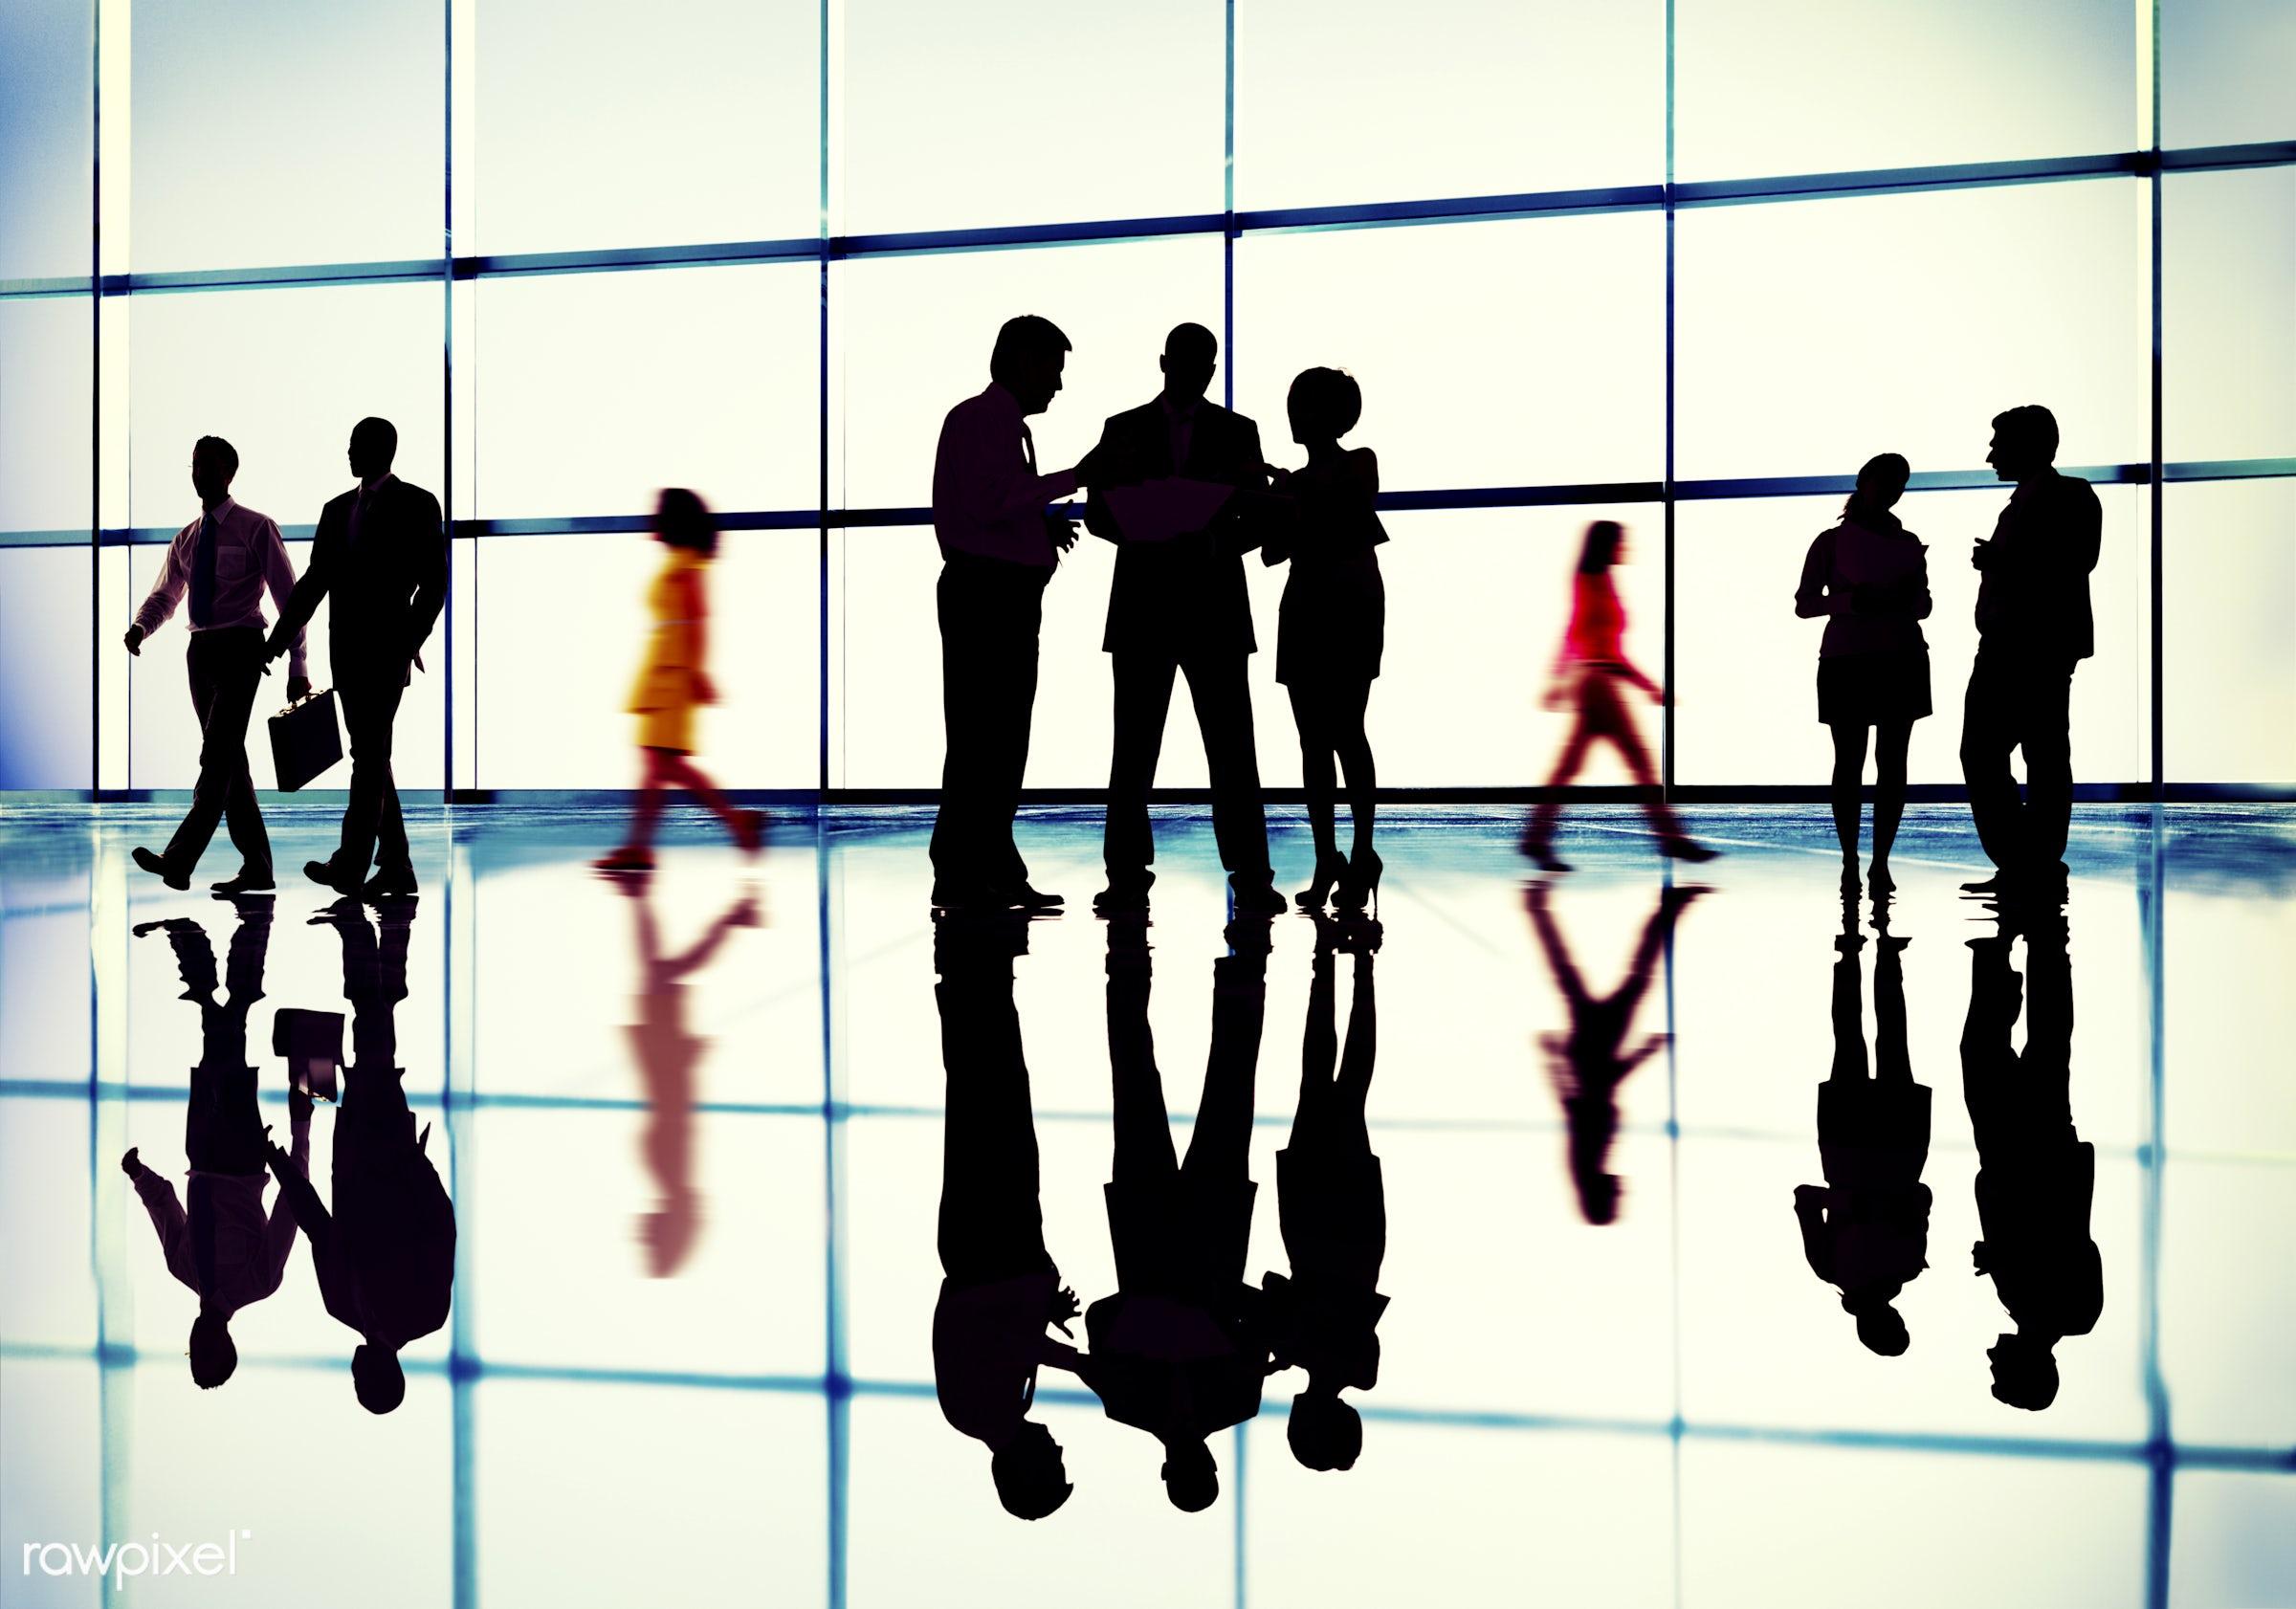 brainstorming, building, business, business people, businessmen, businesswomen, busy, city, colleague, communication,...